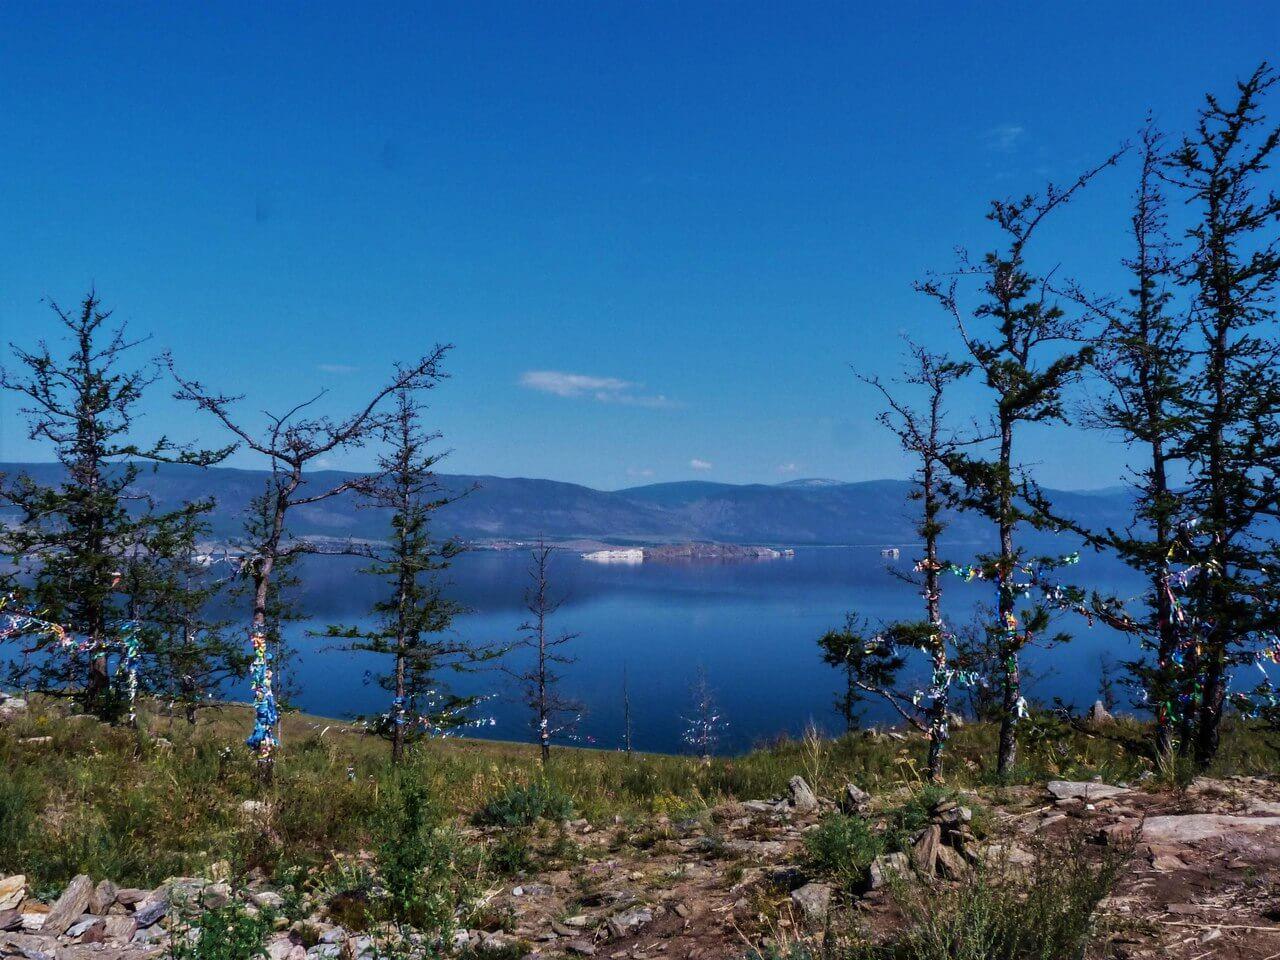 Байкал, остров Ольхон, фото